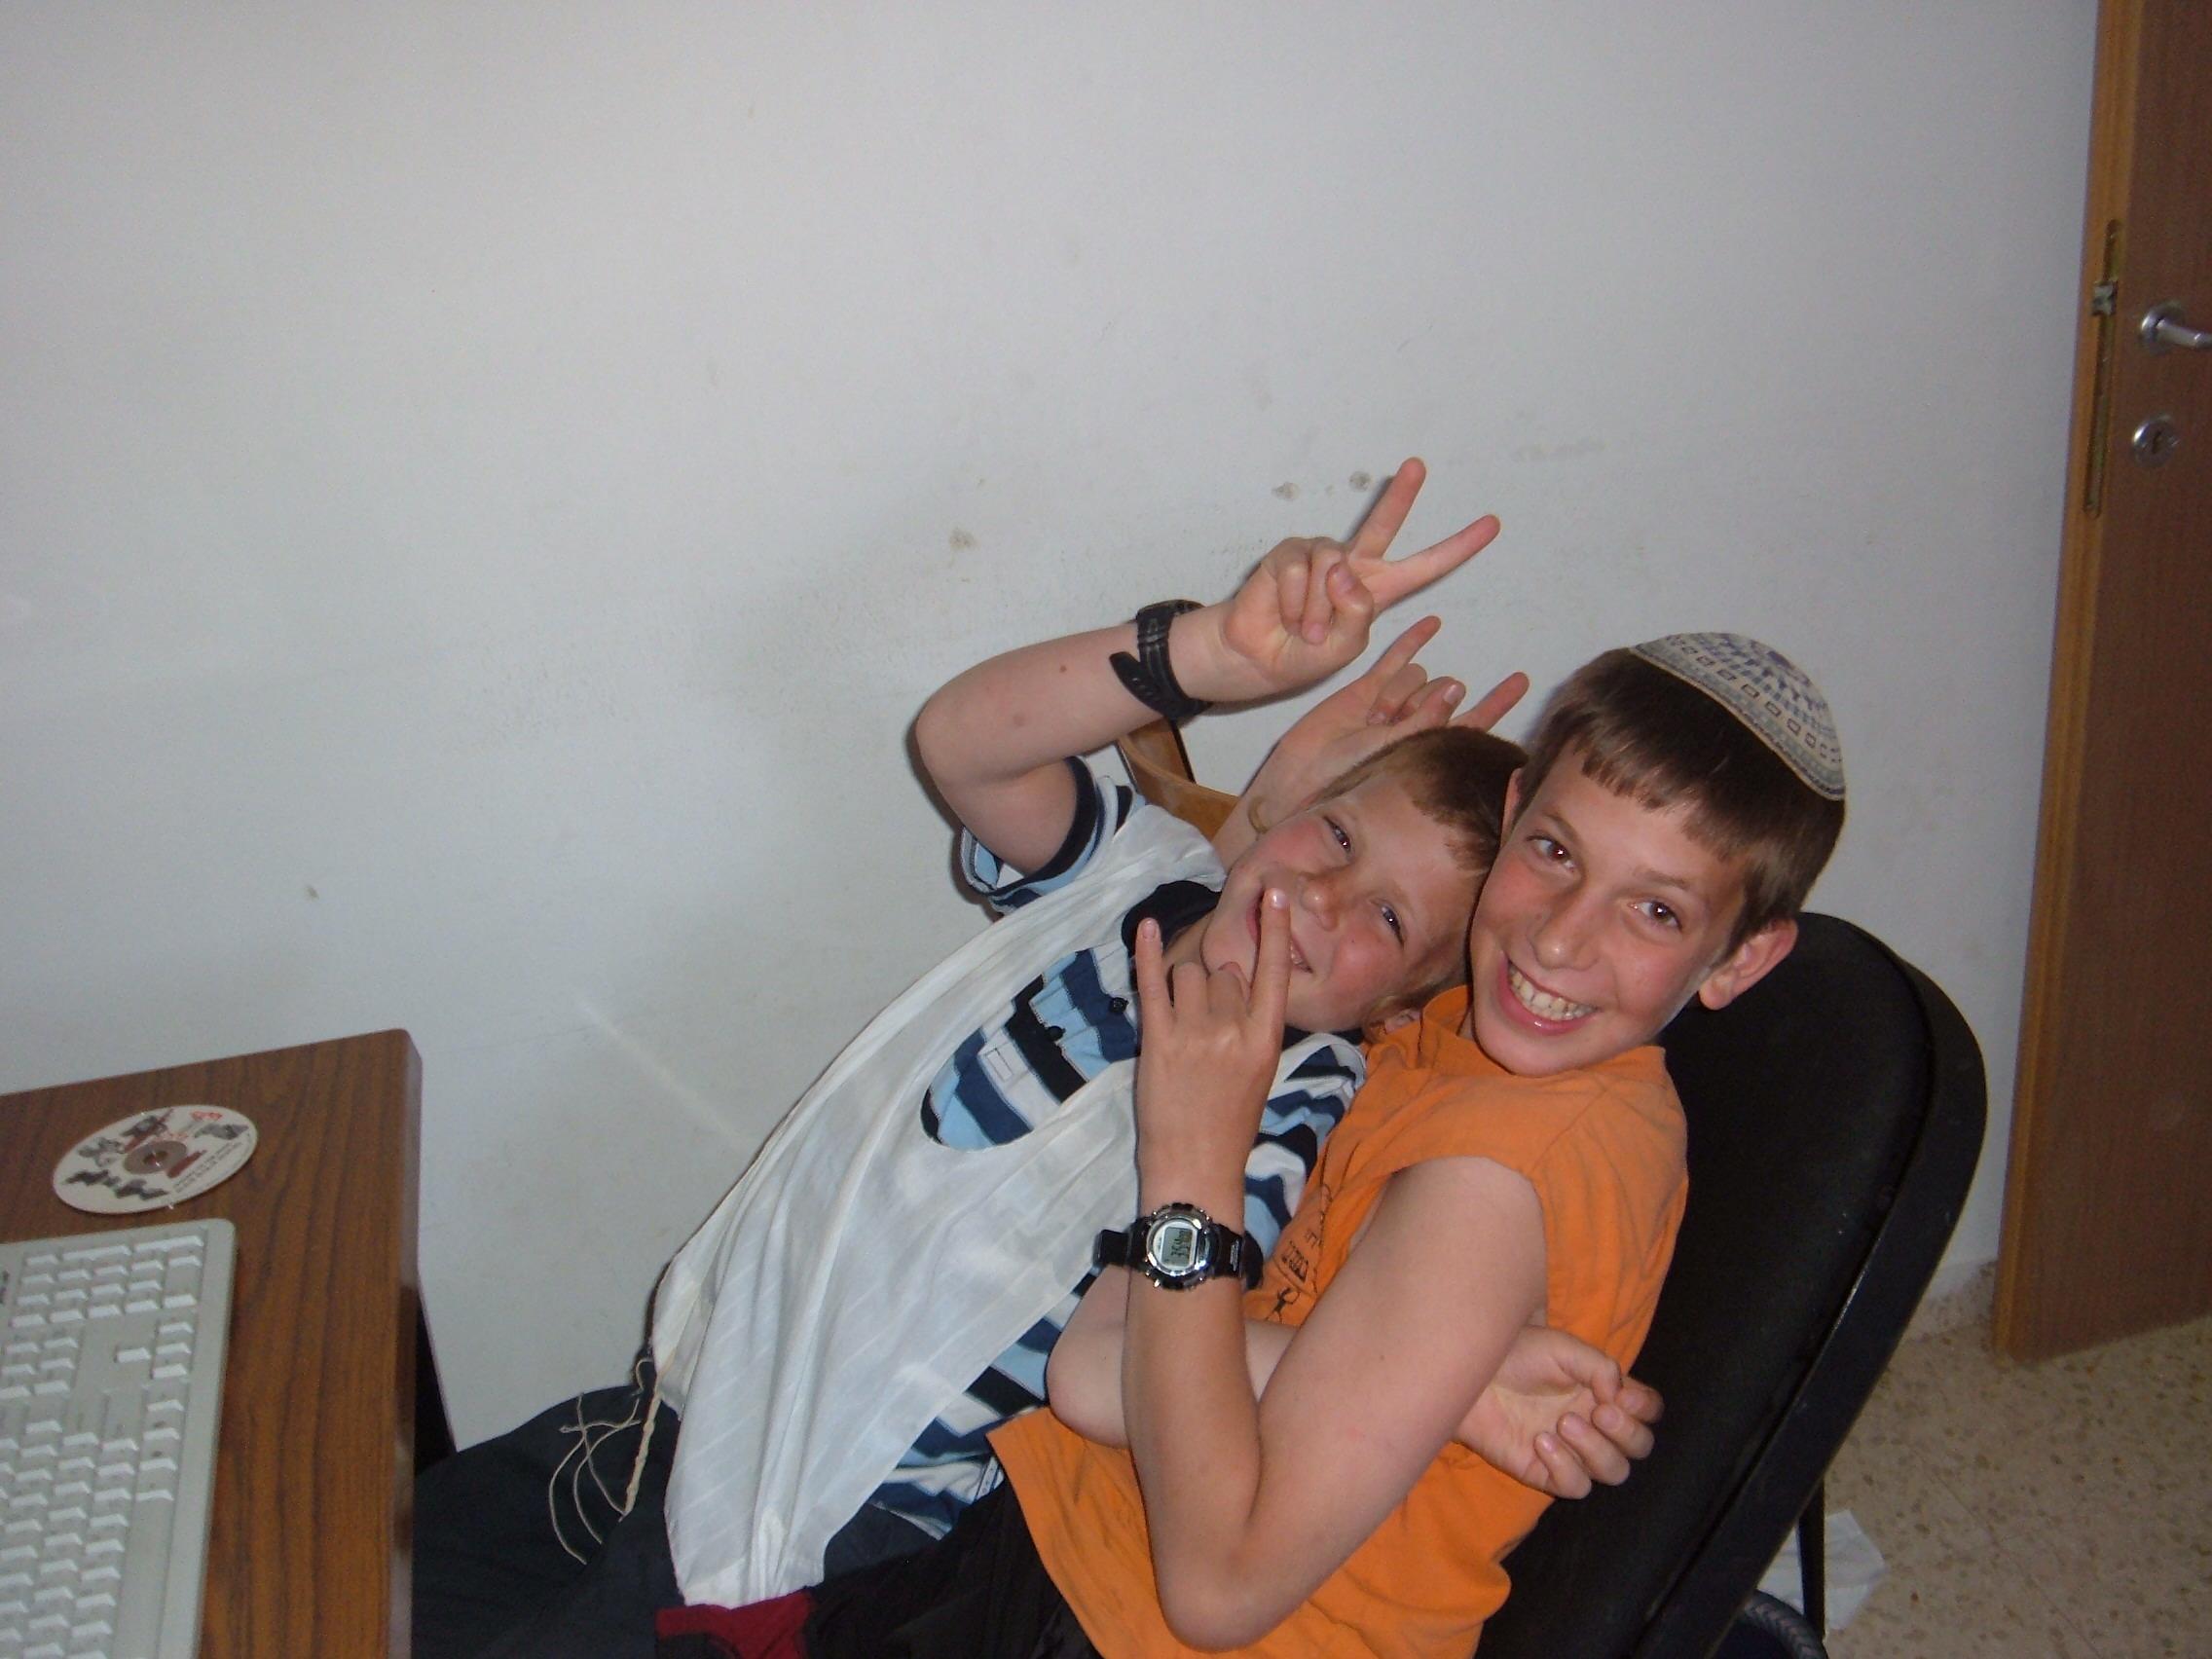 ערב פסח תשסז ישי כמעט בן 12 עם האחיין אליעד באבד